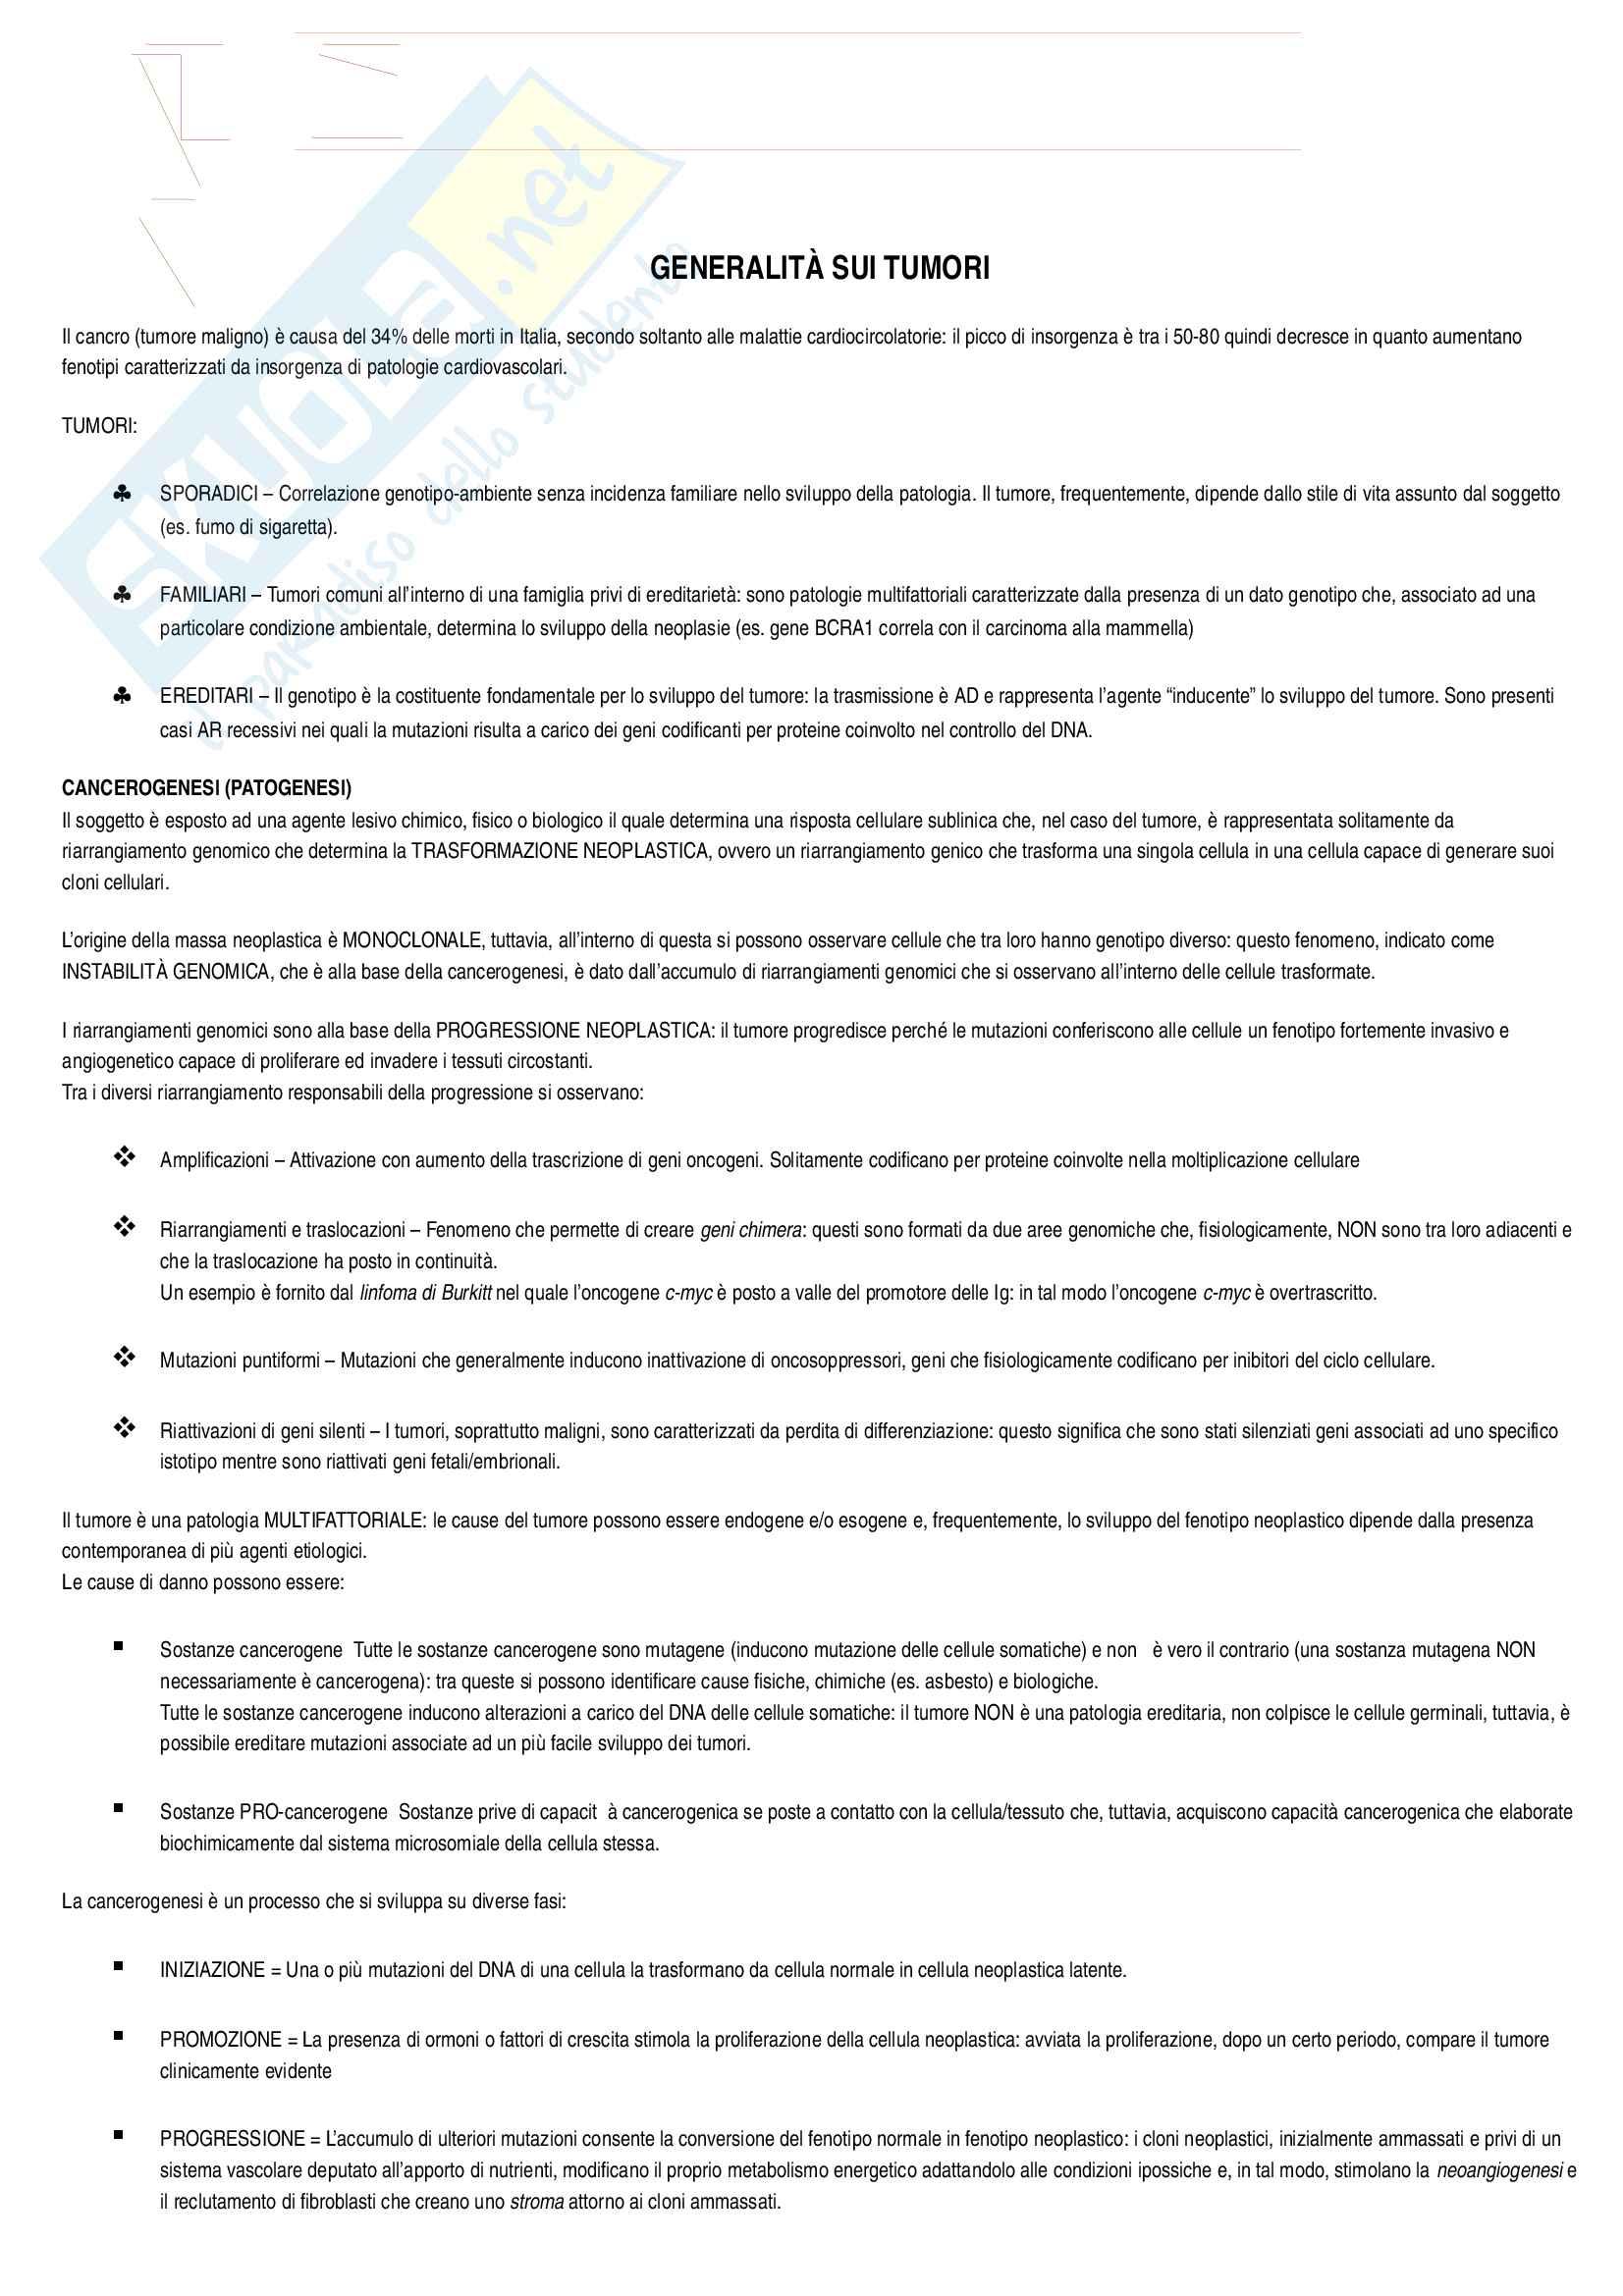 Patologia generale - Oncologia